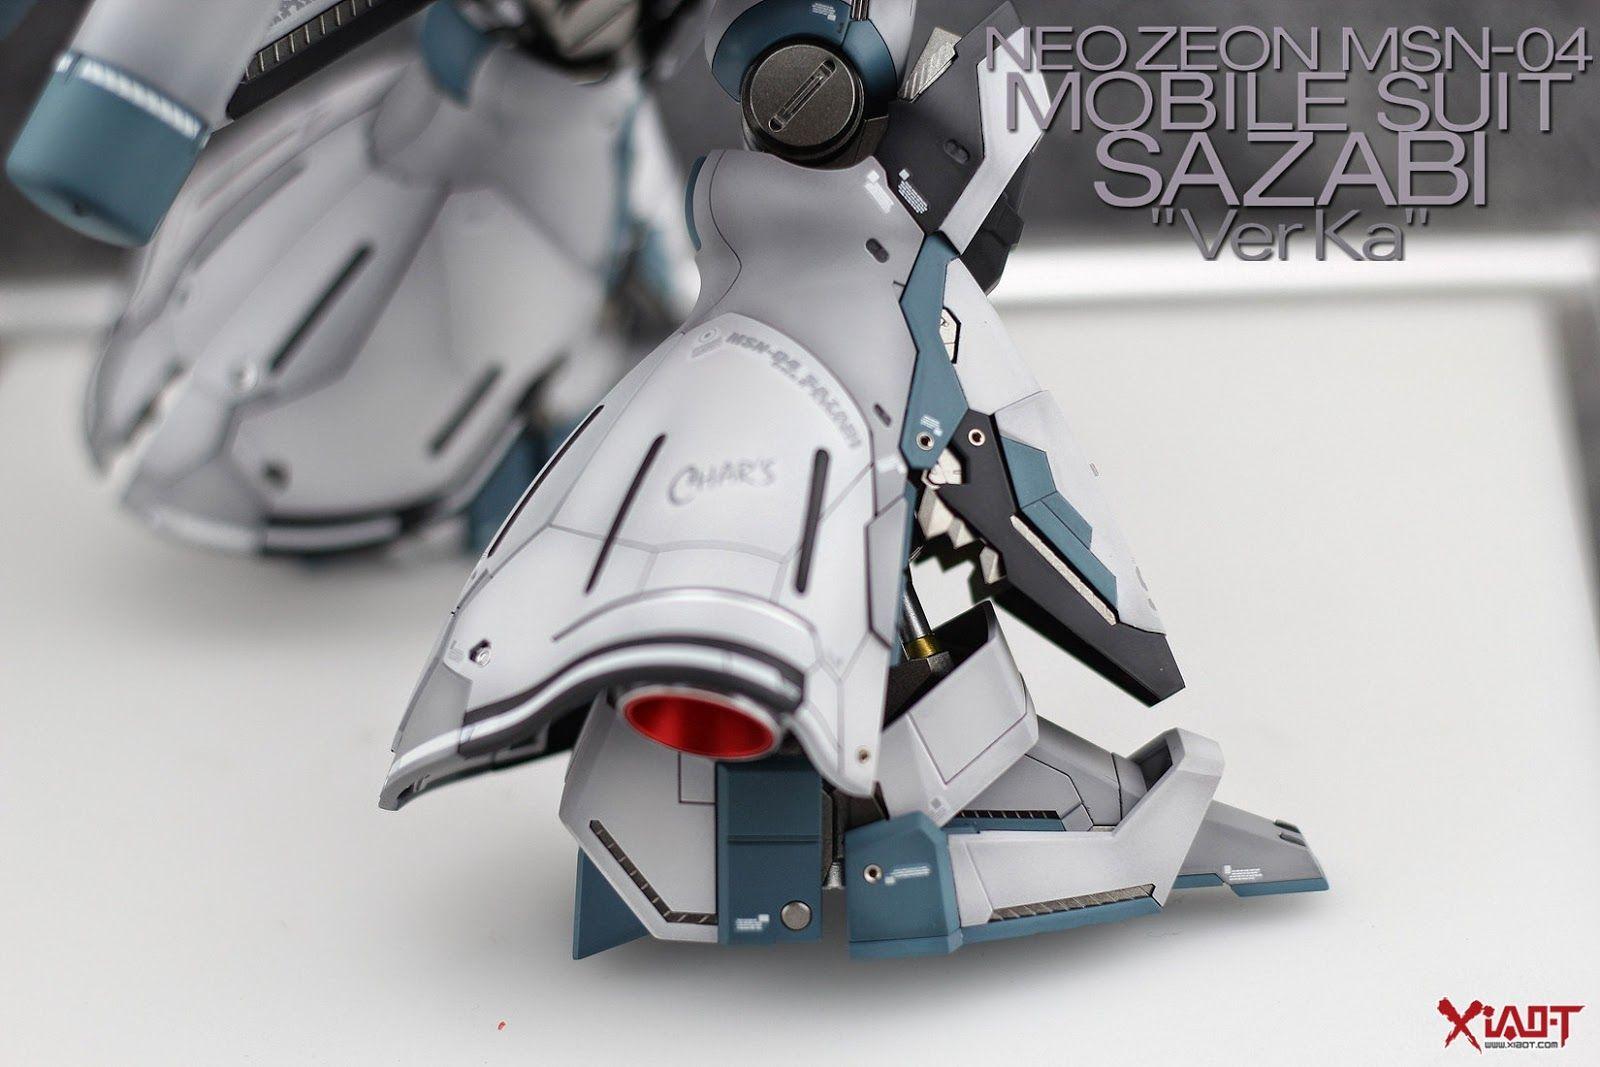 MG 1/100 Sazabi Ver.Ka - Painted Build   Modeled by Jon-K